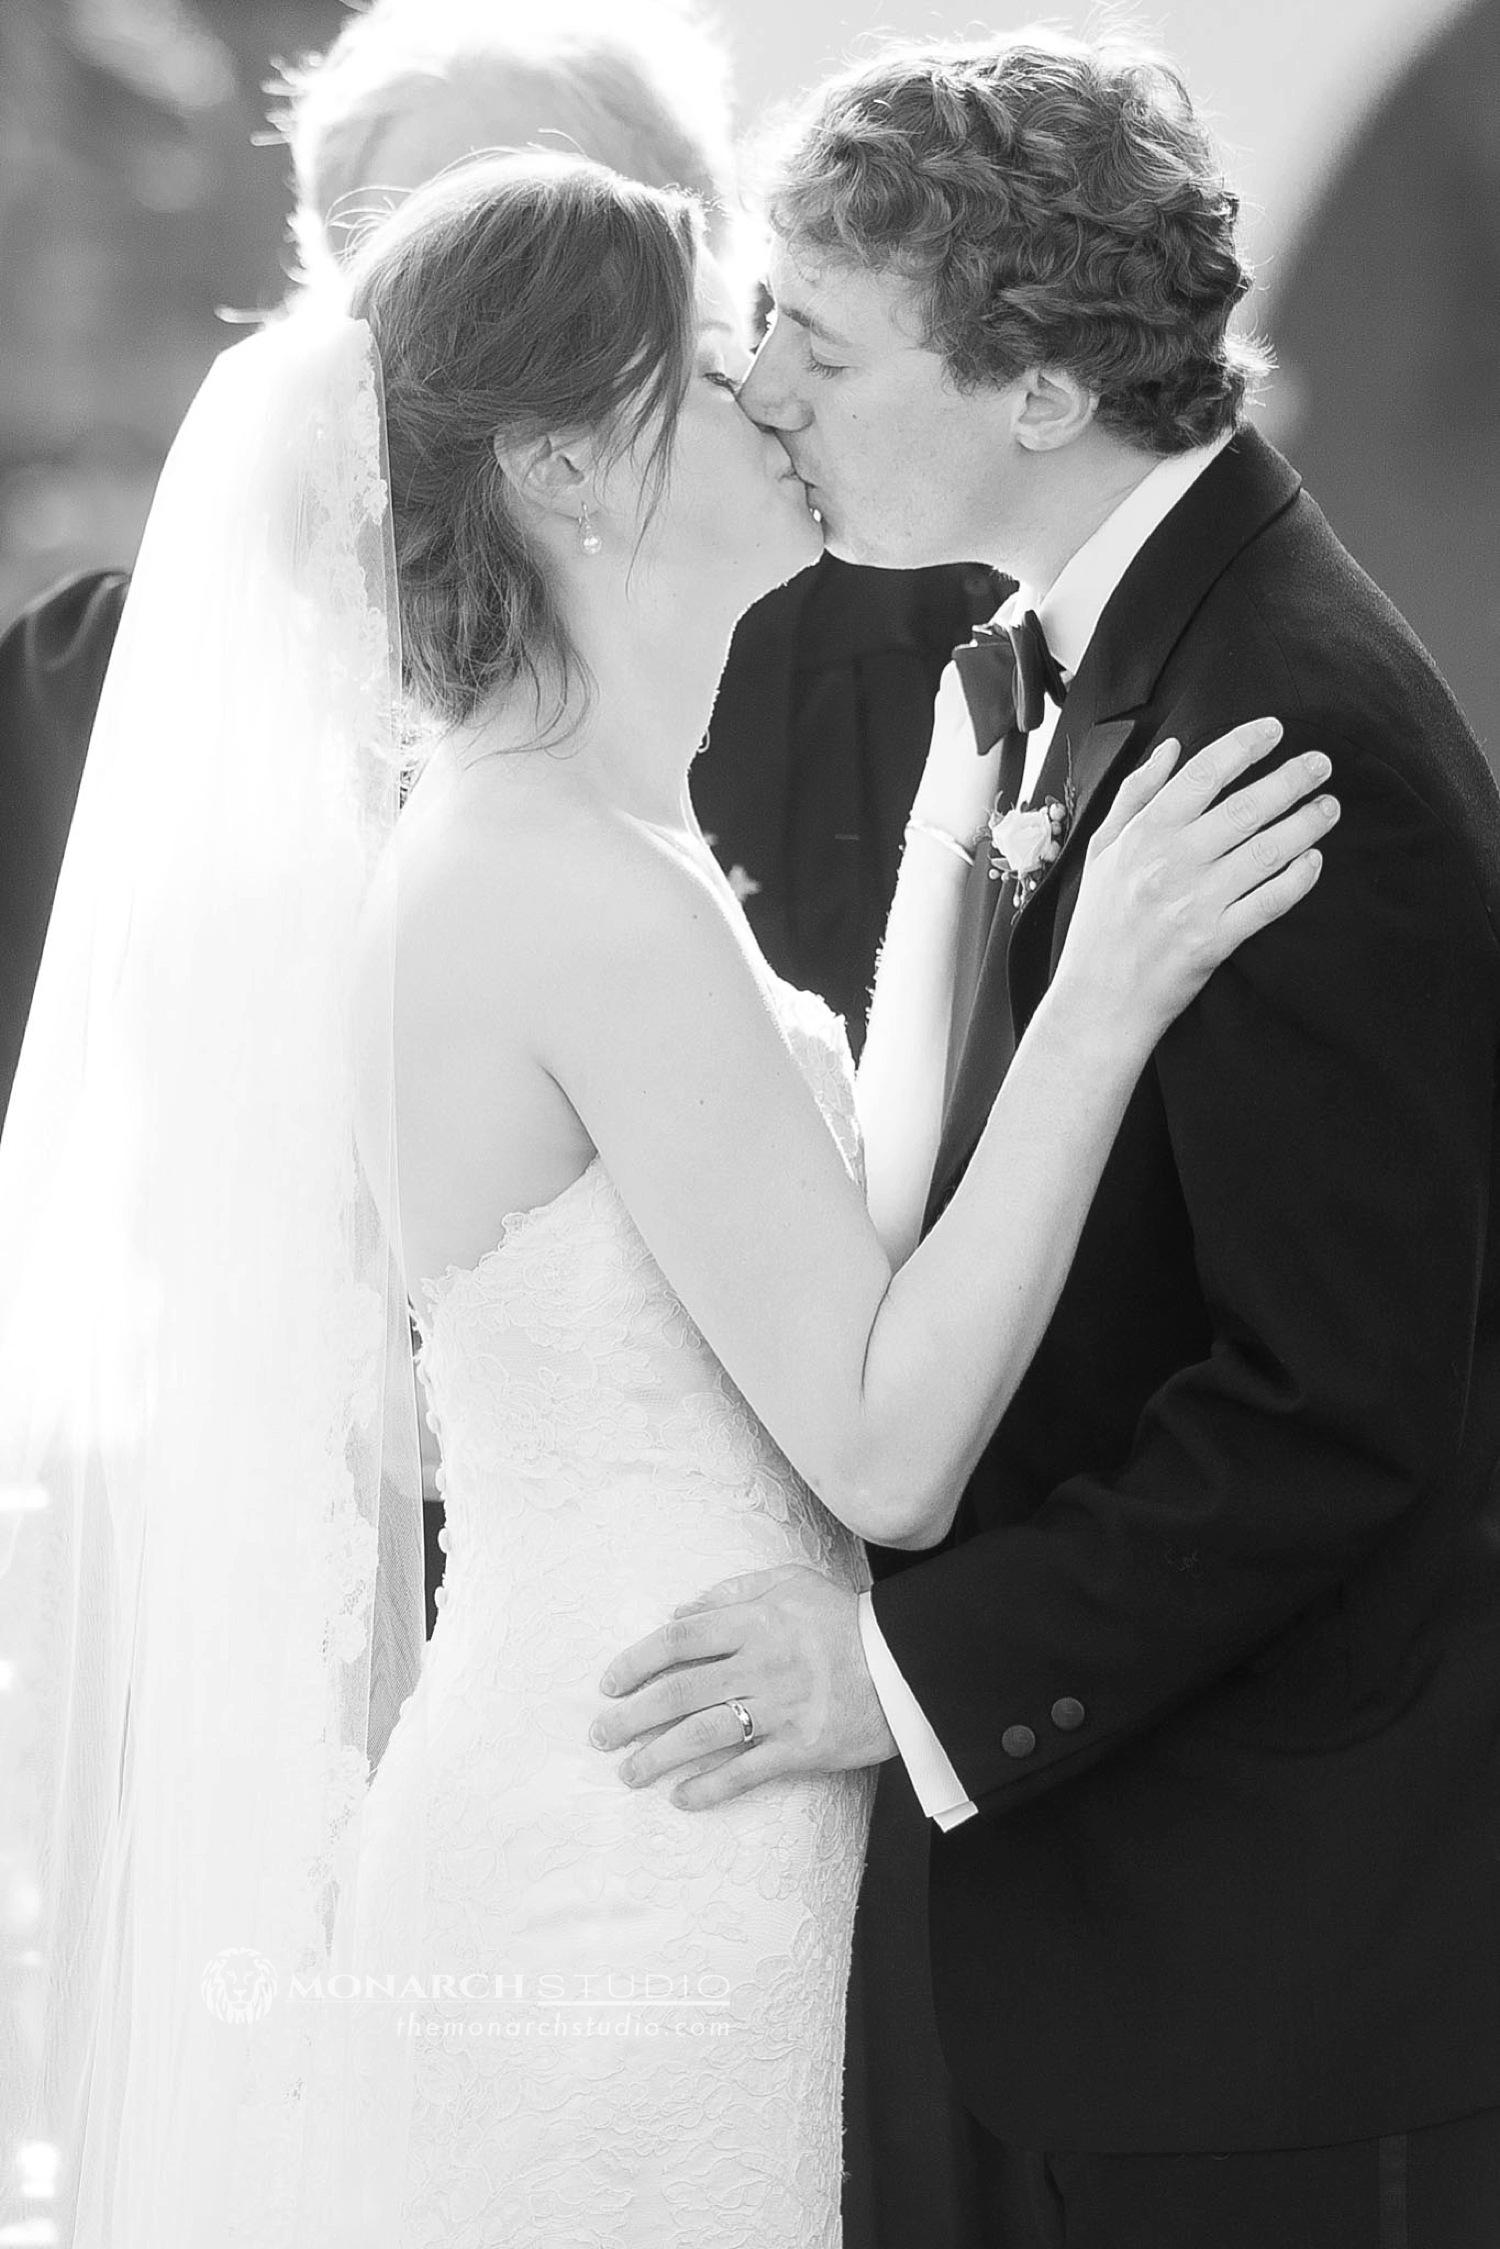 St-Augustine-Wedding-Photographer-Zach-Thomas-Riverhouse-Monarch-082.JPG